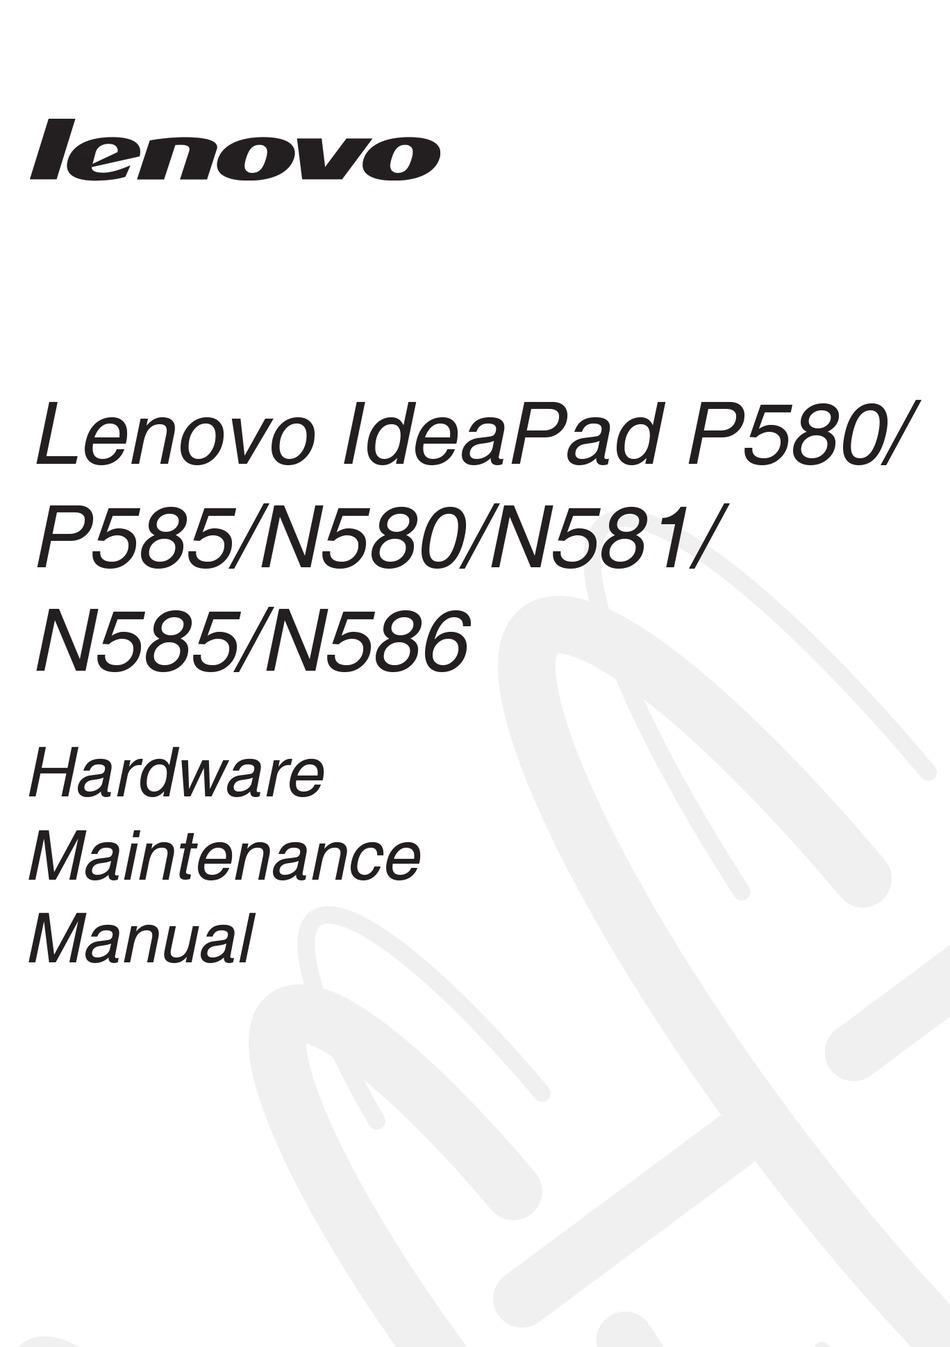 LENOVO IDEAPAD N585 HARDWARE MAINTENANCE MANUAL Pdf